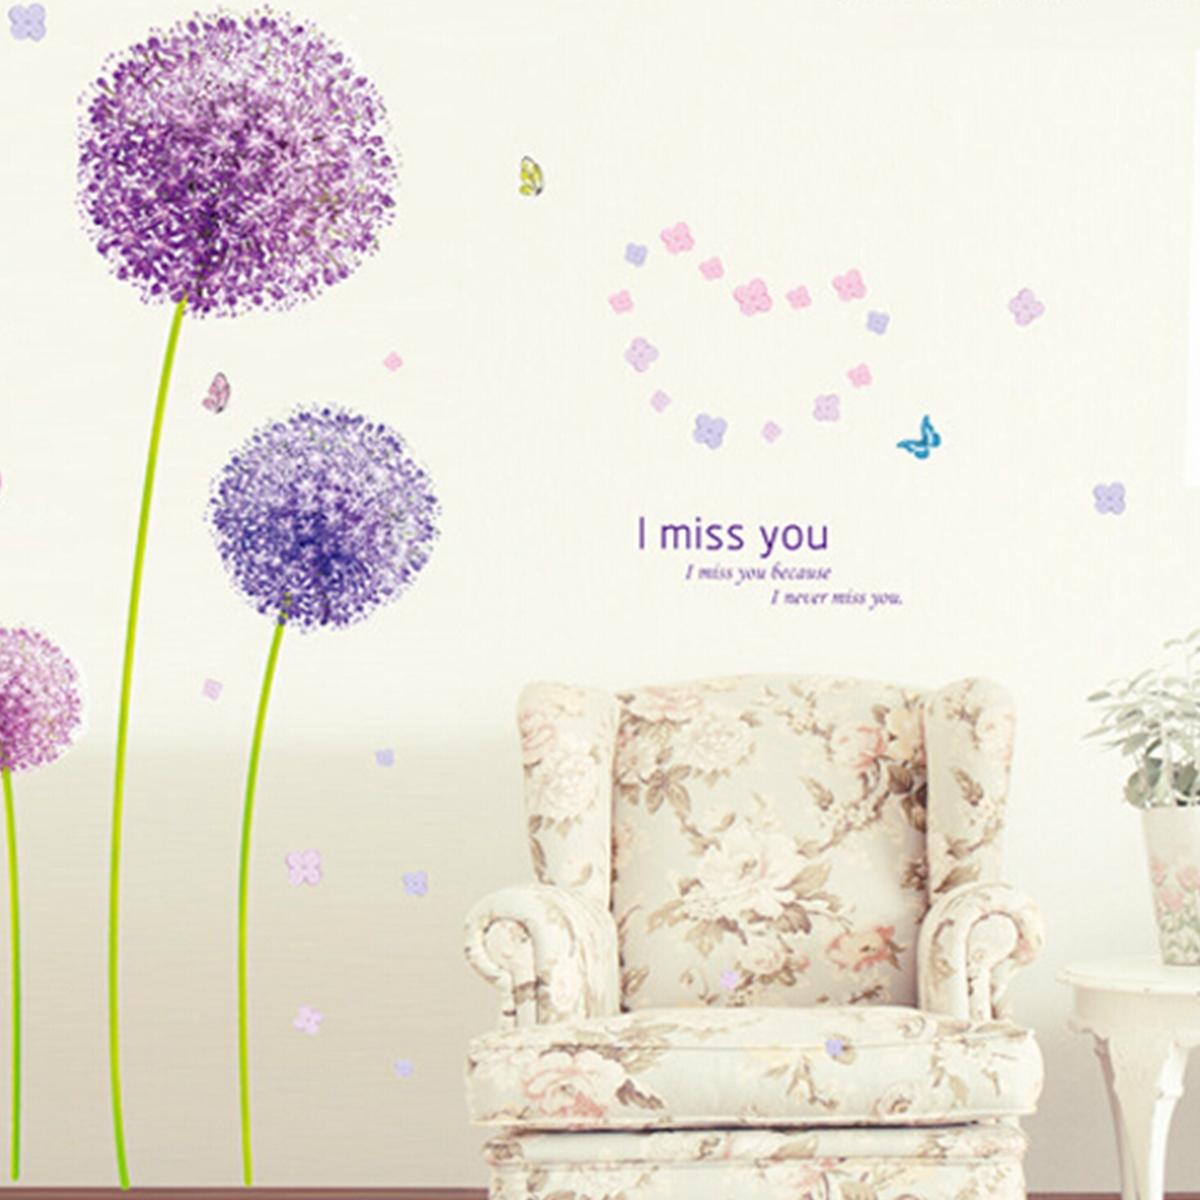 Sticker Mural Sakura Fleur Autocollant Romantique D Coration Salon Chambre Ebay